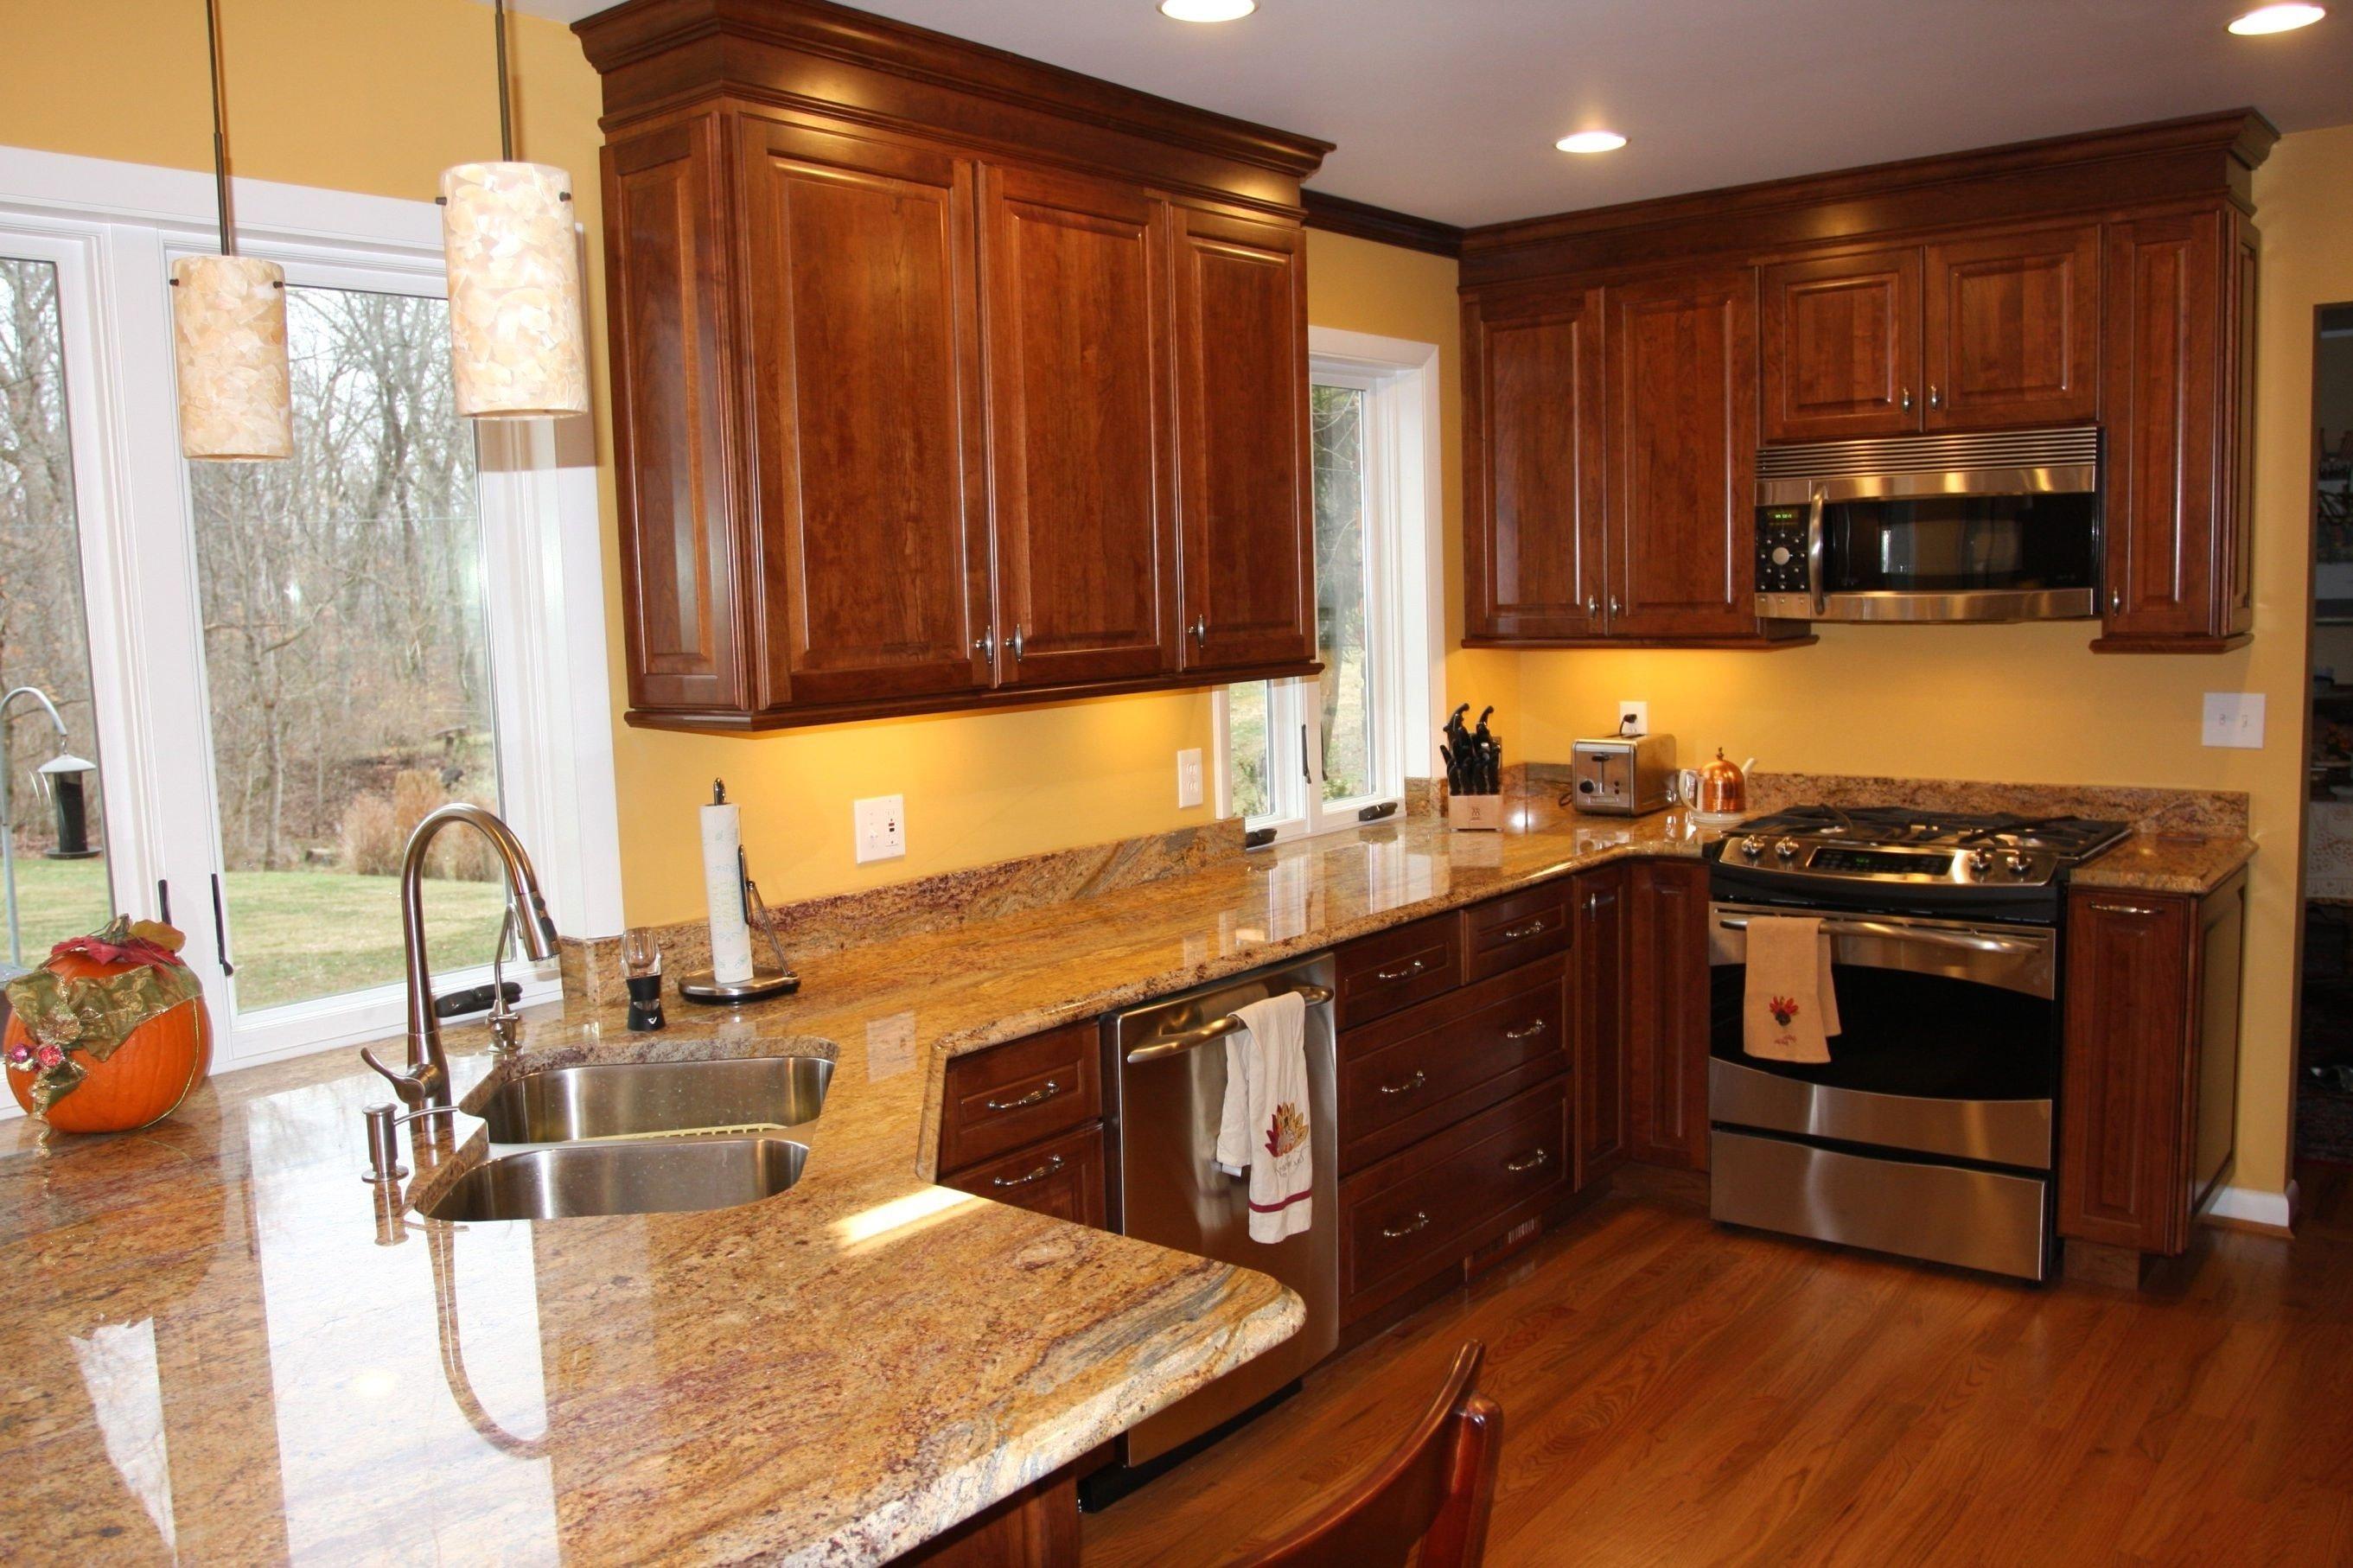 10 Pretty Kitchen Paint Ideas With Dark Cabinets stone countertops kitchen paint colors with dark cabinets lighting 2020